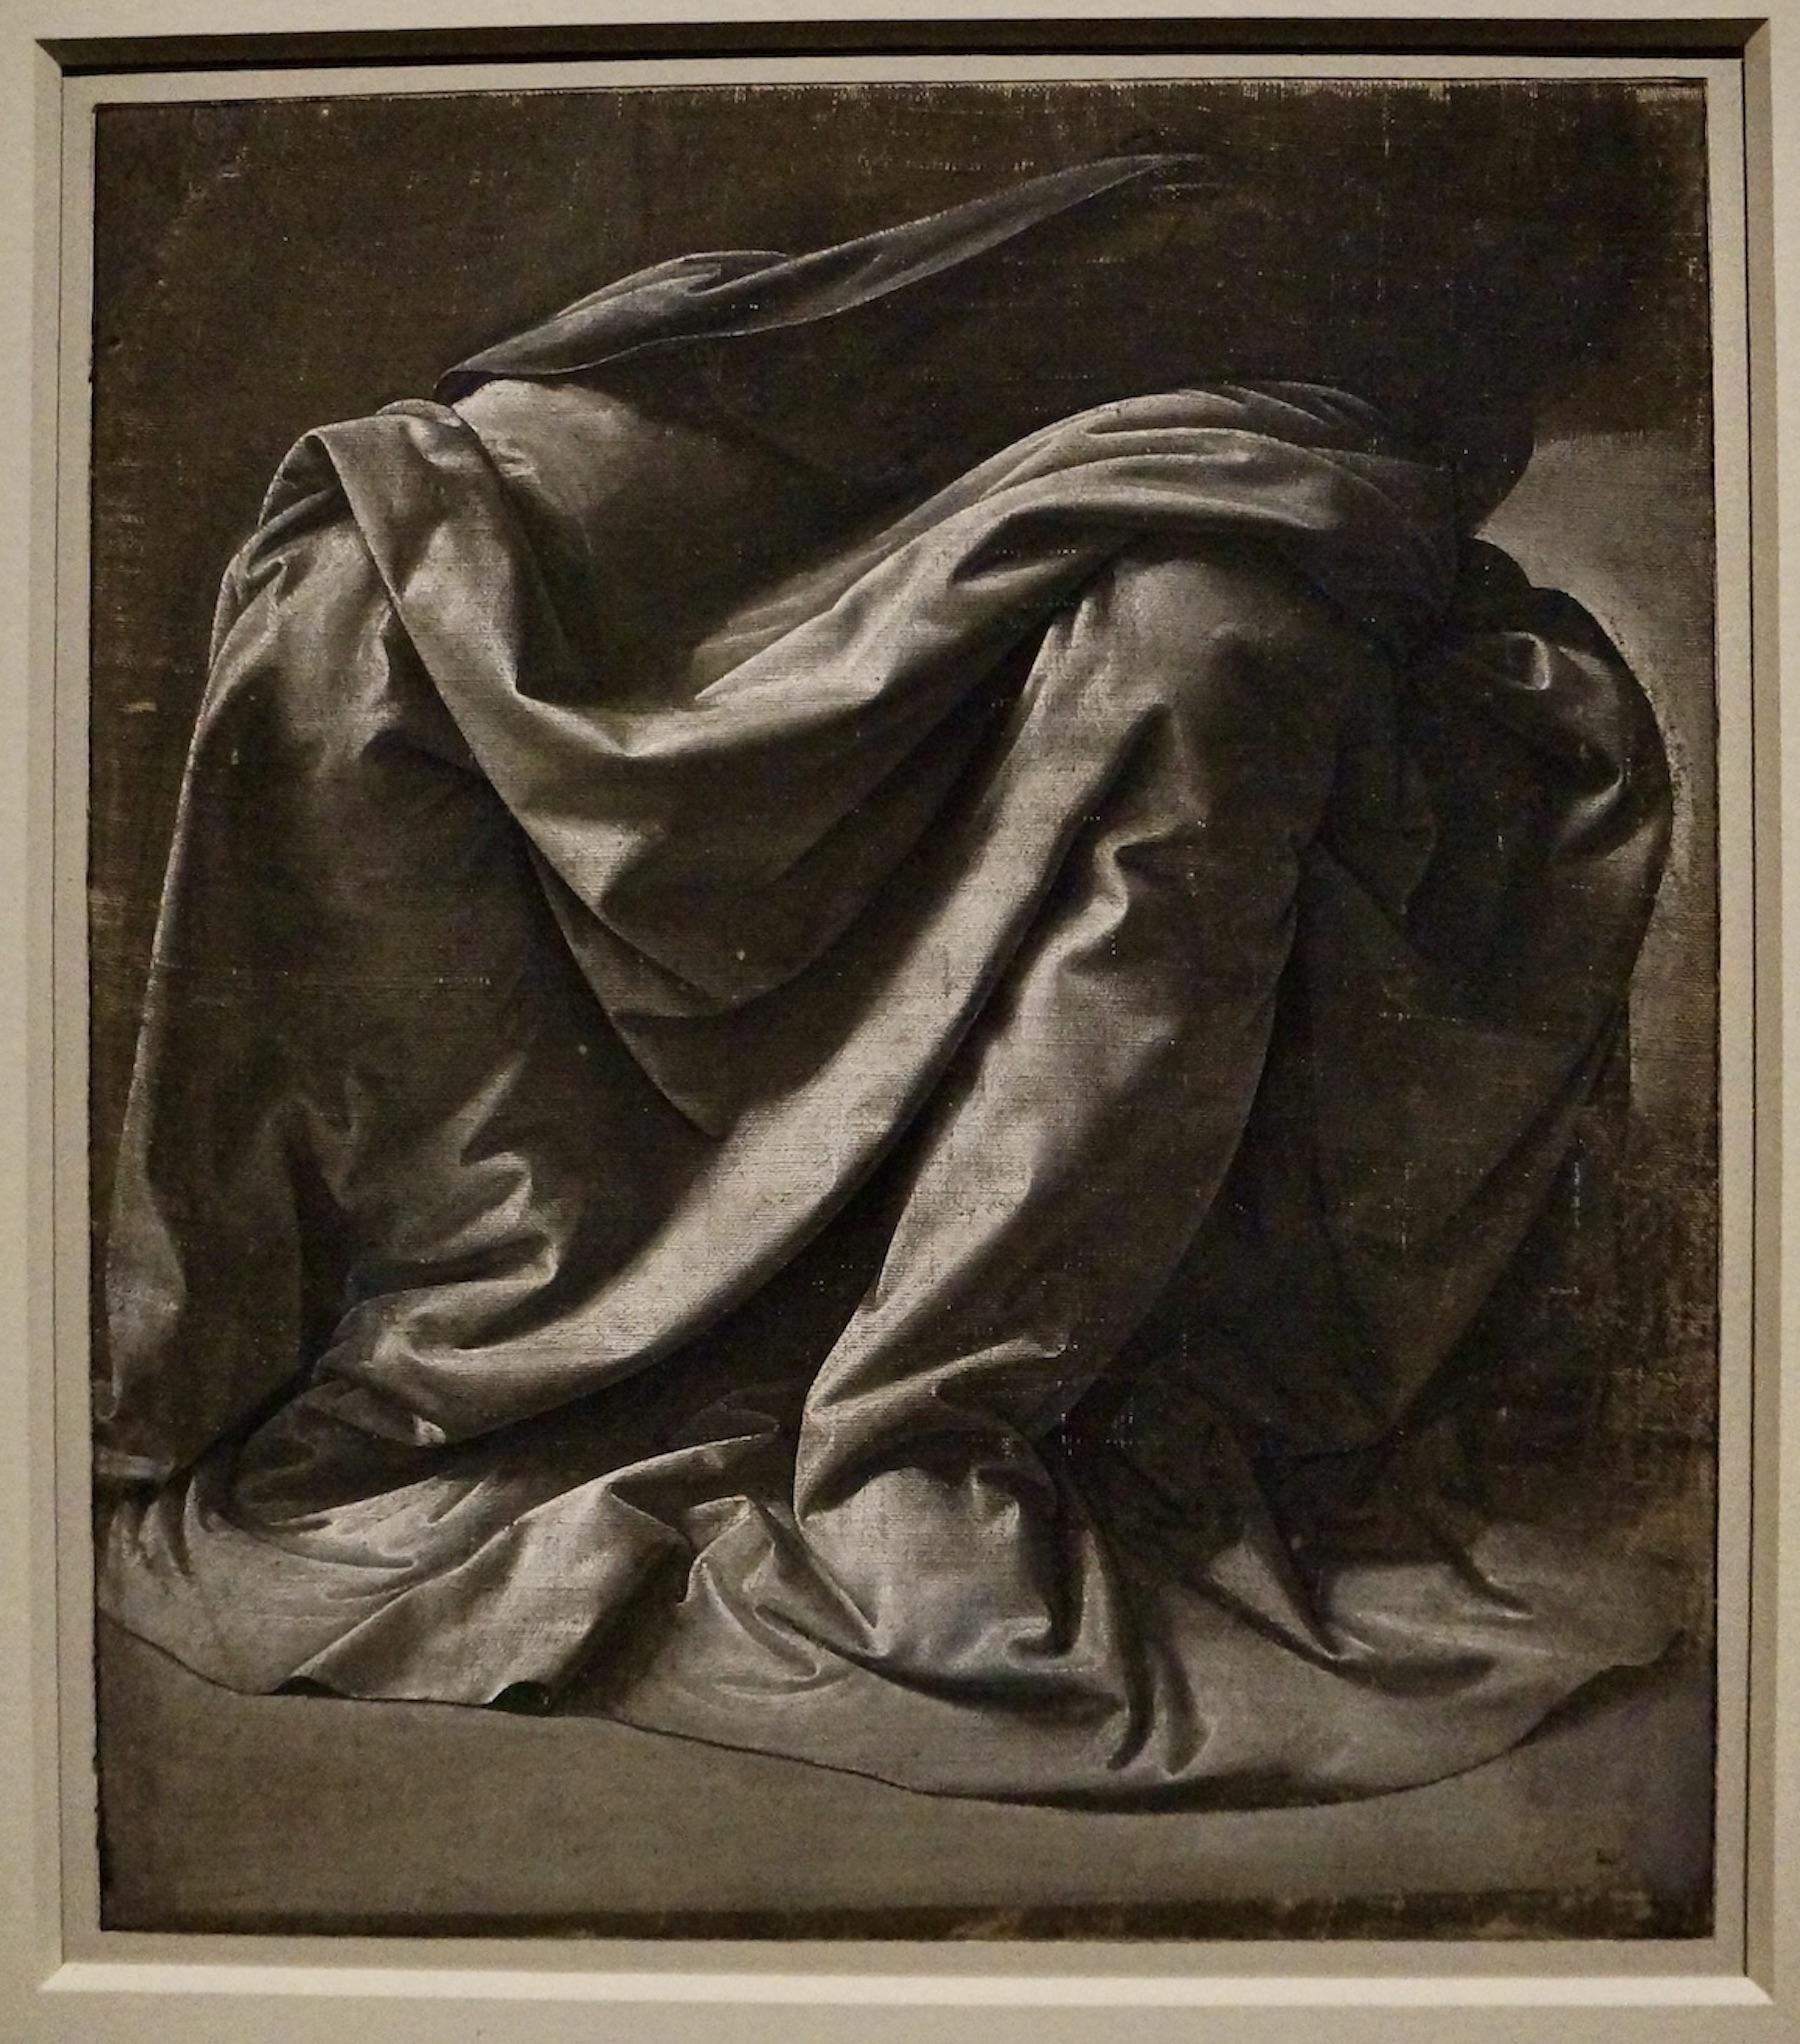 Da Vinci Louvre detail sketch